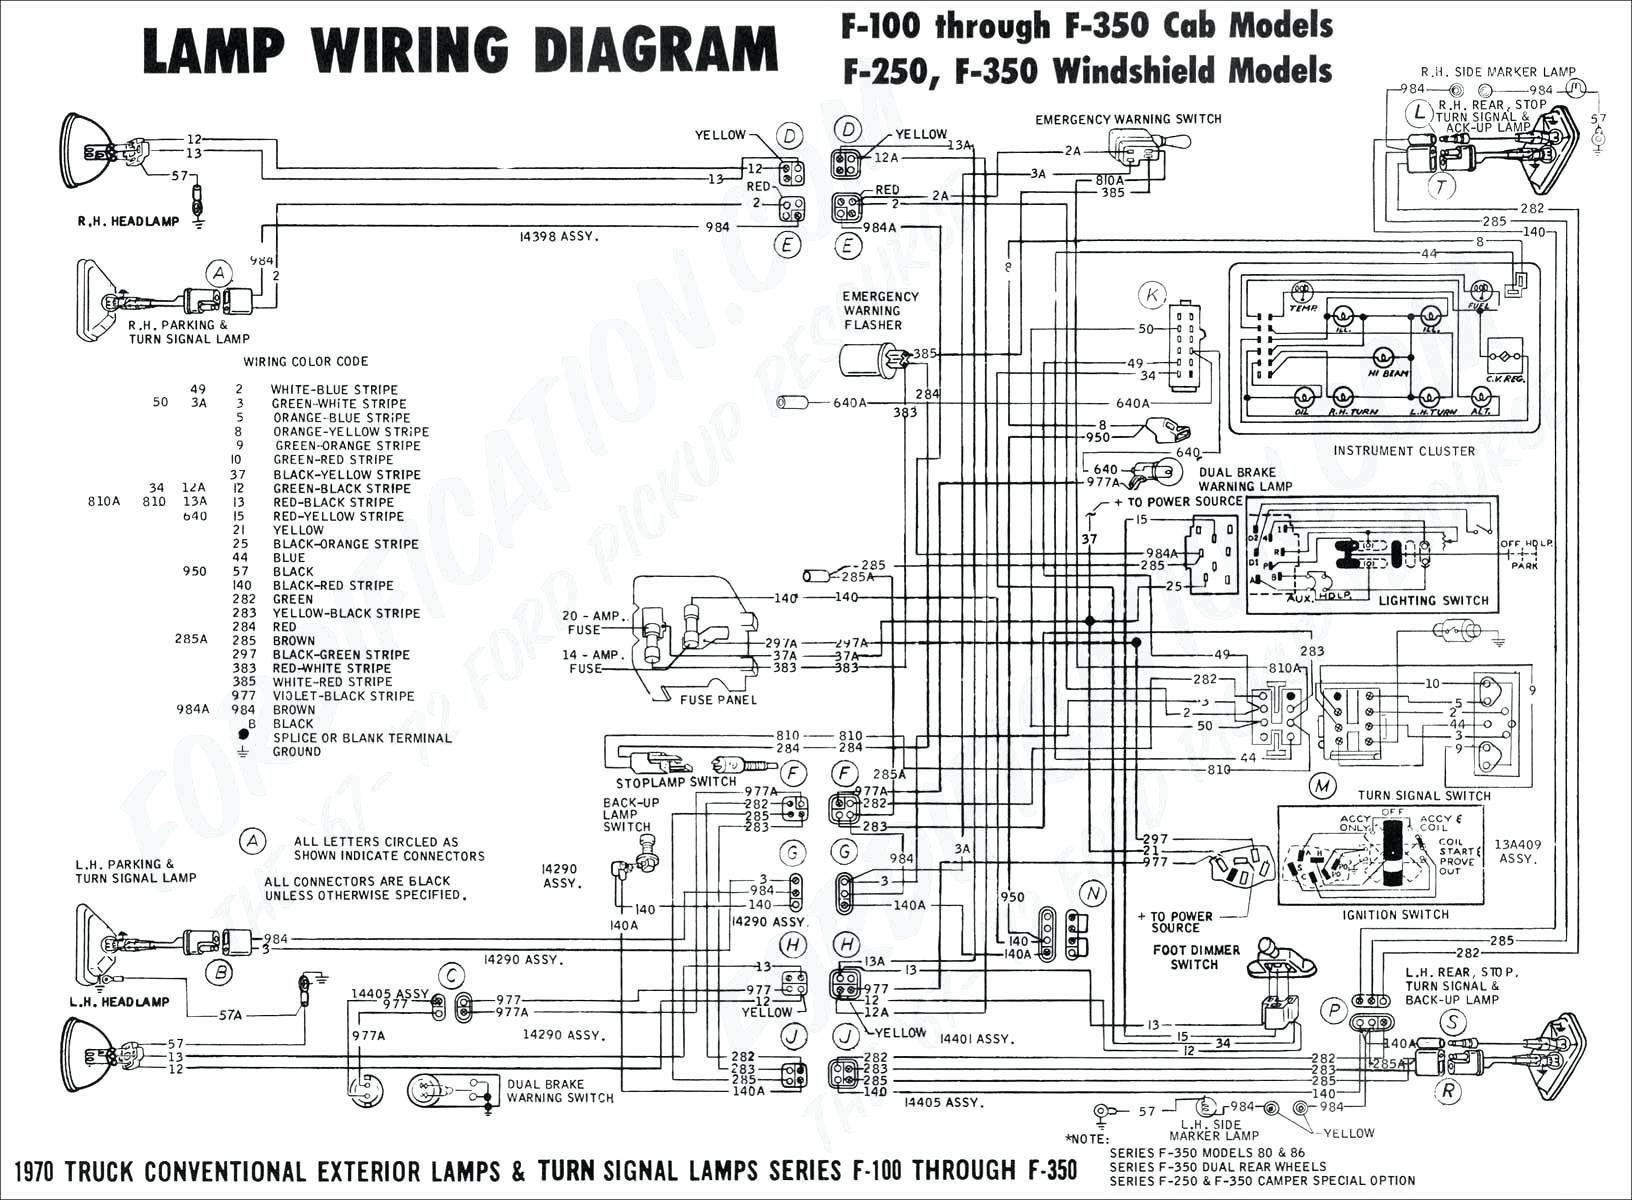 Toyota 4runner Engine Diagram 1997 4runner Fuse Diagram Wiring Diagram Datasource Of Toyota 4runner Engine Diagram 1995 toyota T100 Dx 4×4 Xtracab 5 Spd Manual W Od